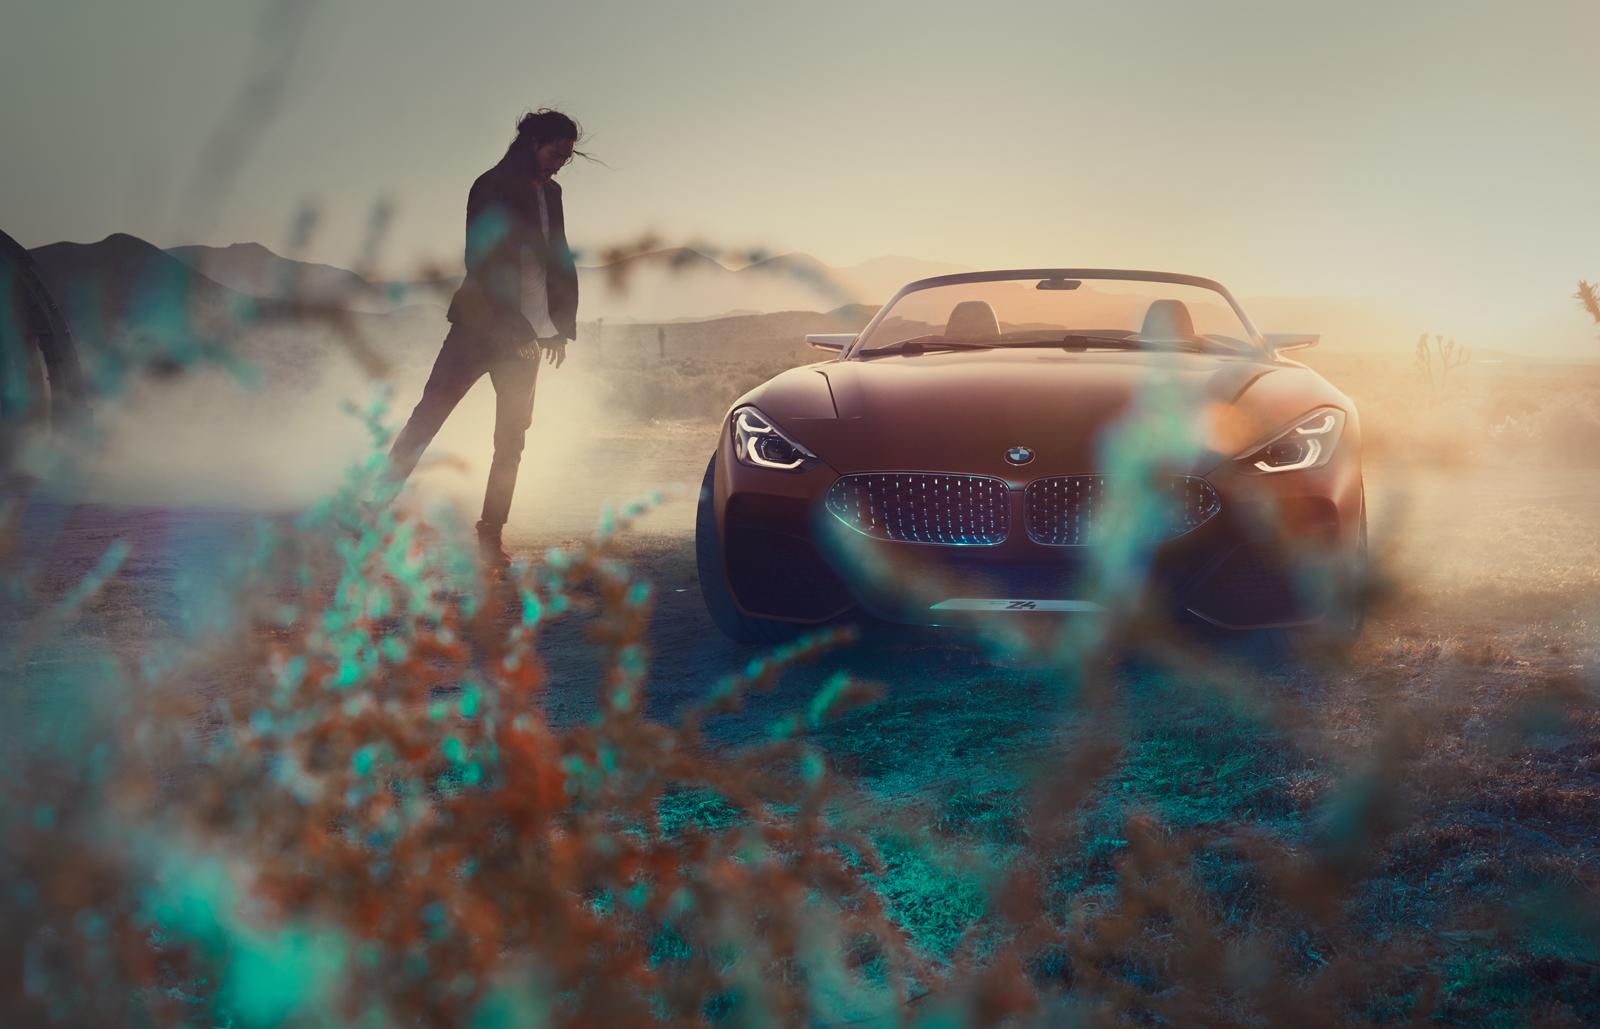 BMW_DCC070_06.jpg